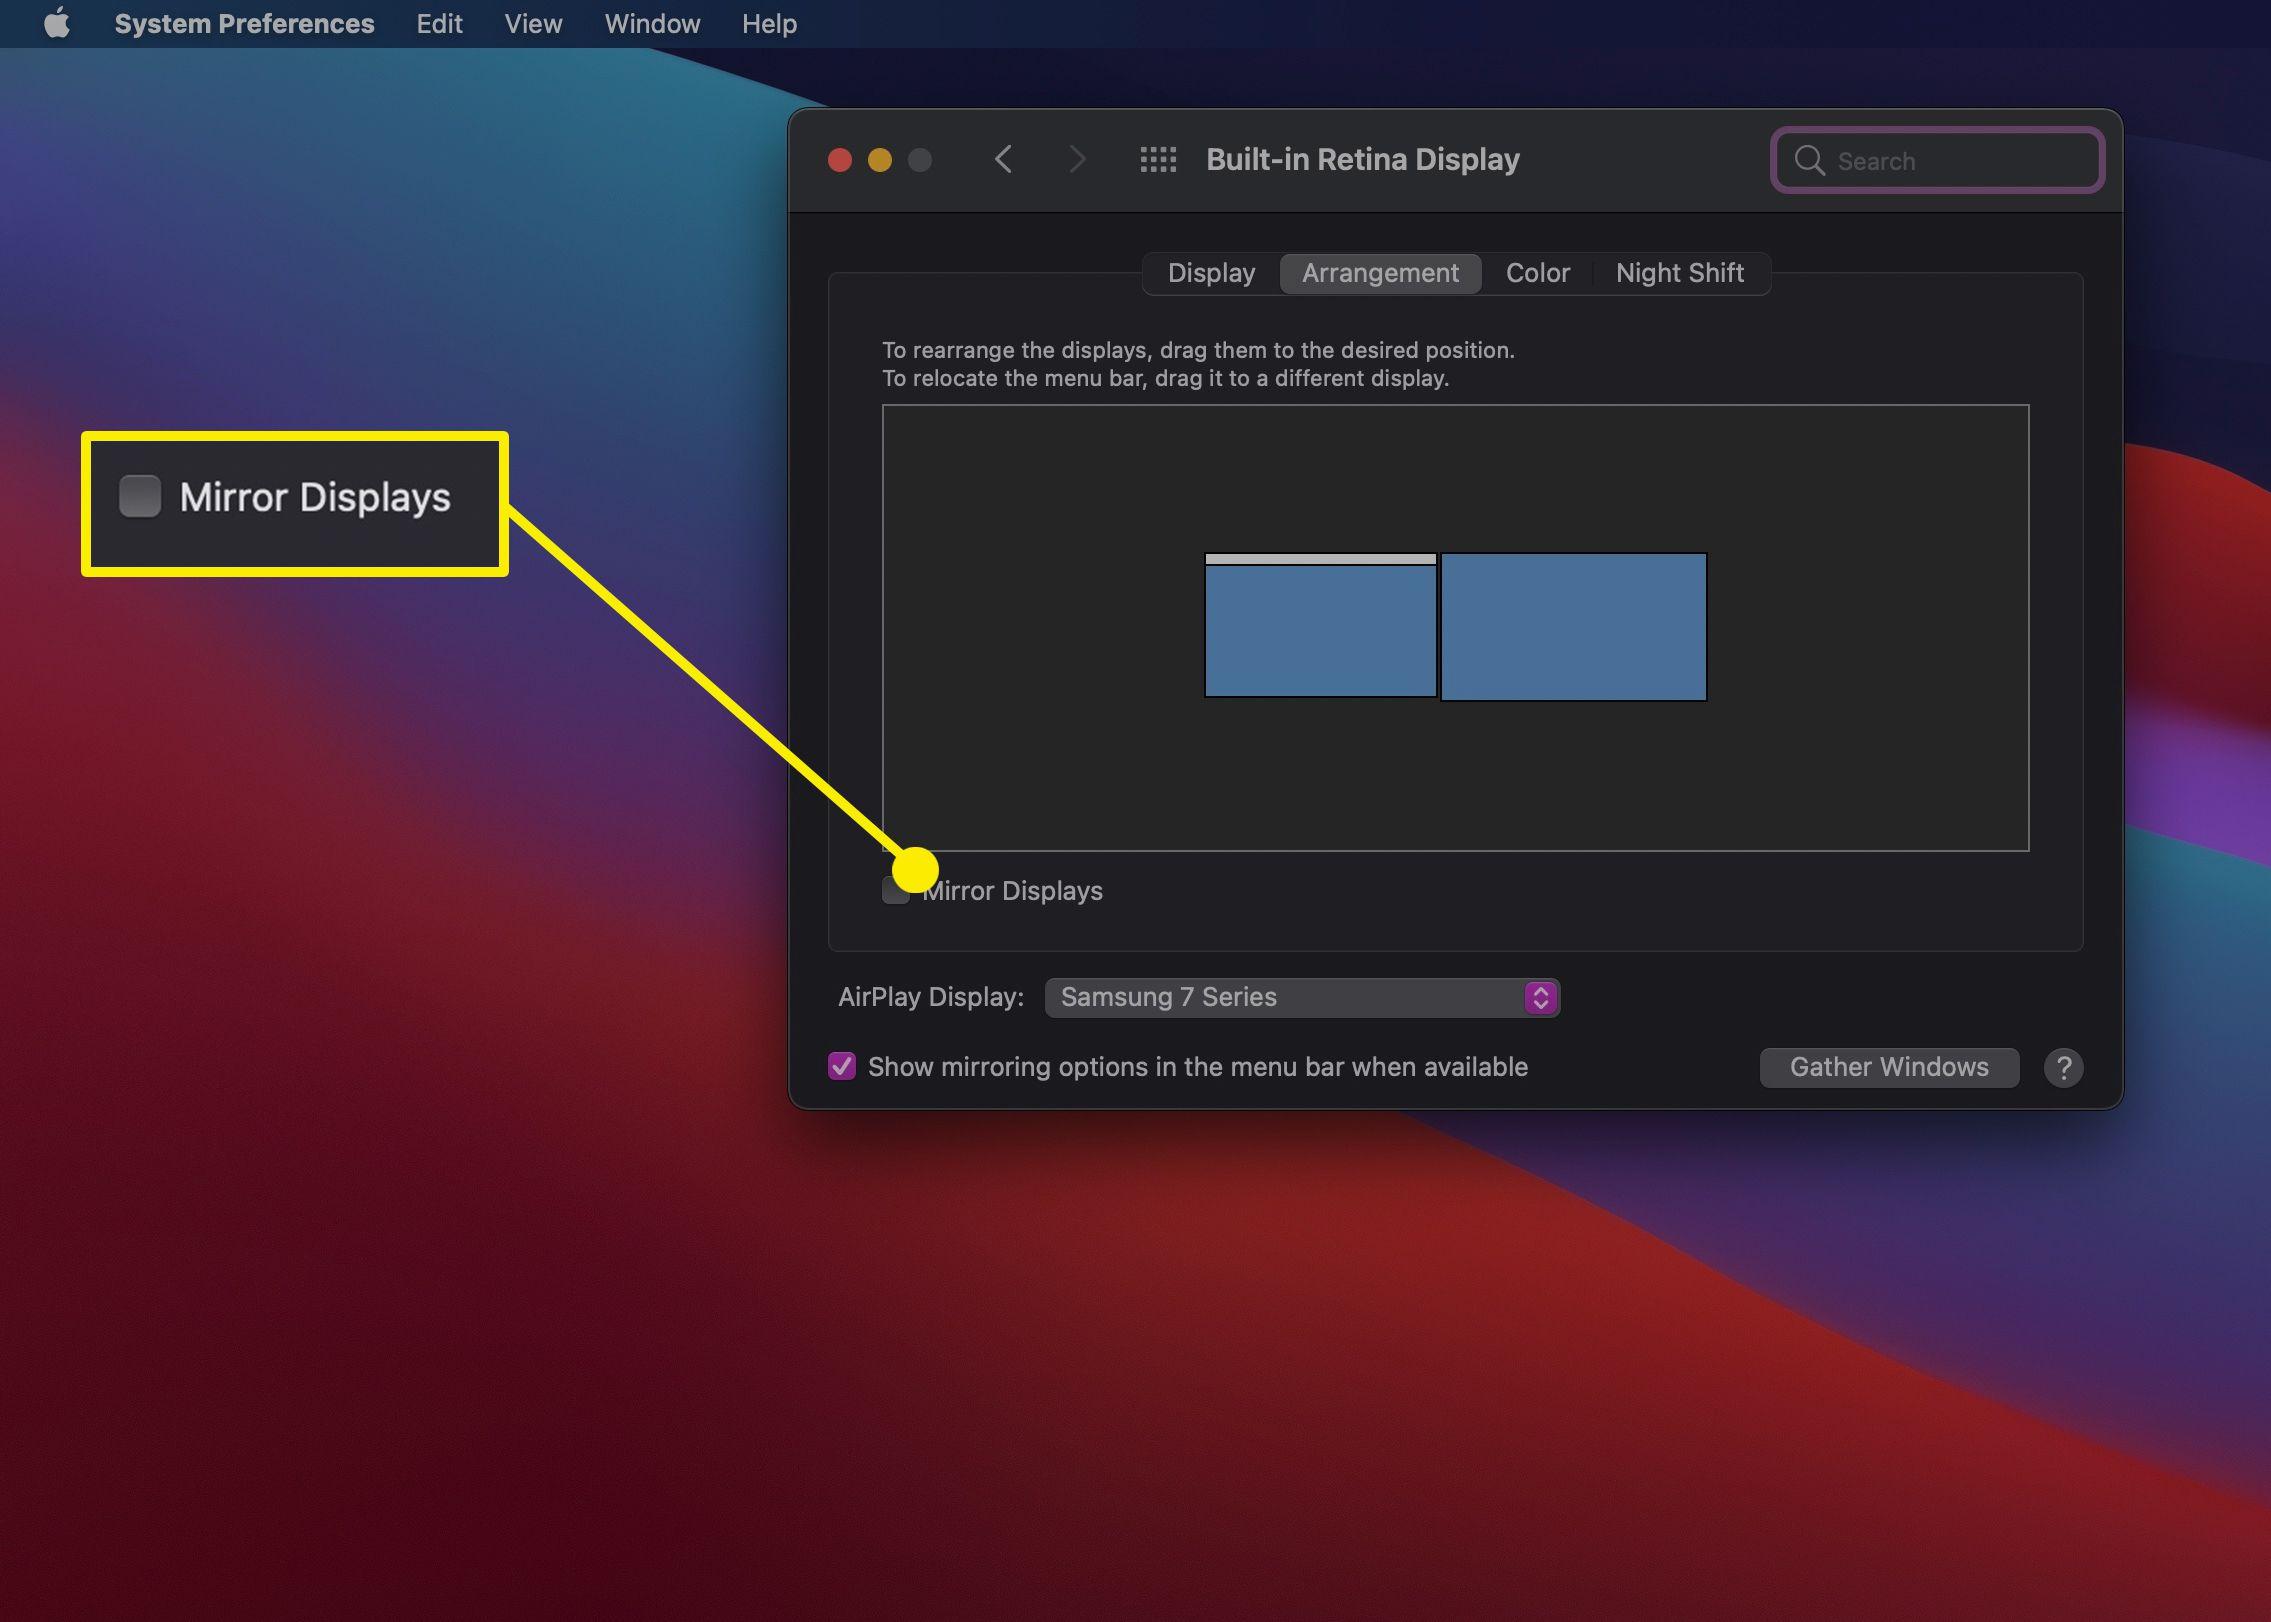 The Mirror Displays option in Display Settings on a MacBook.